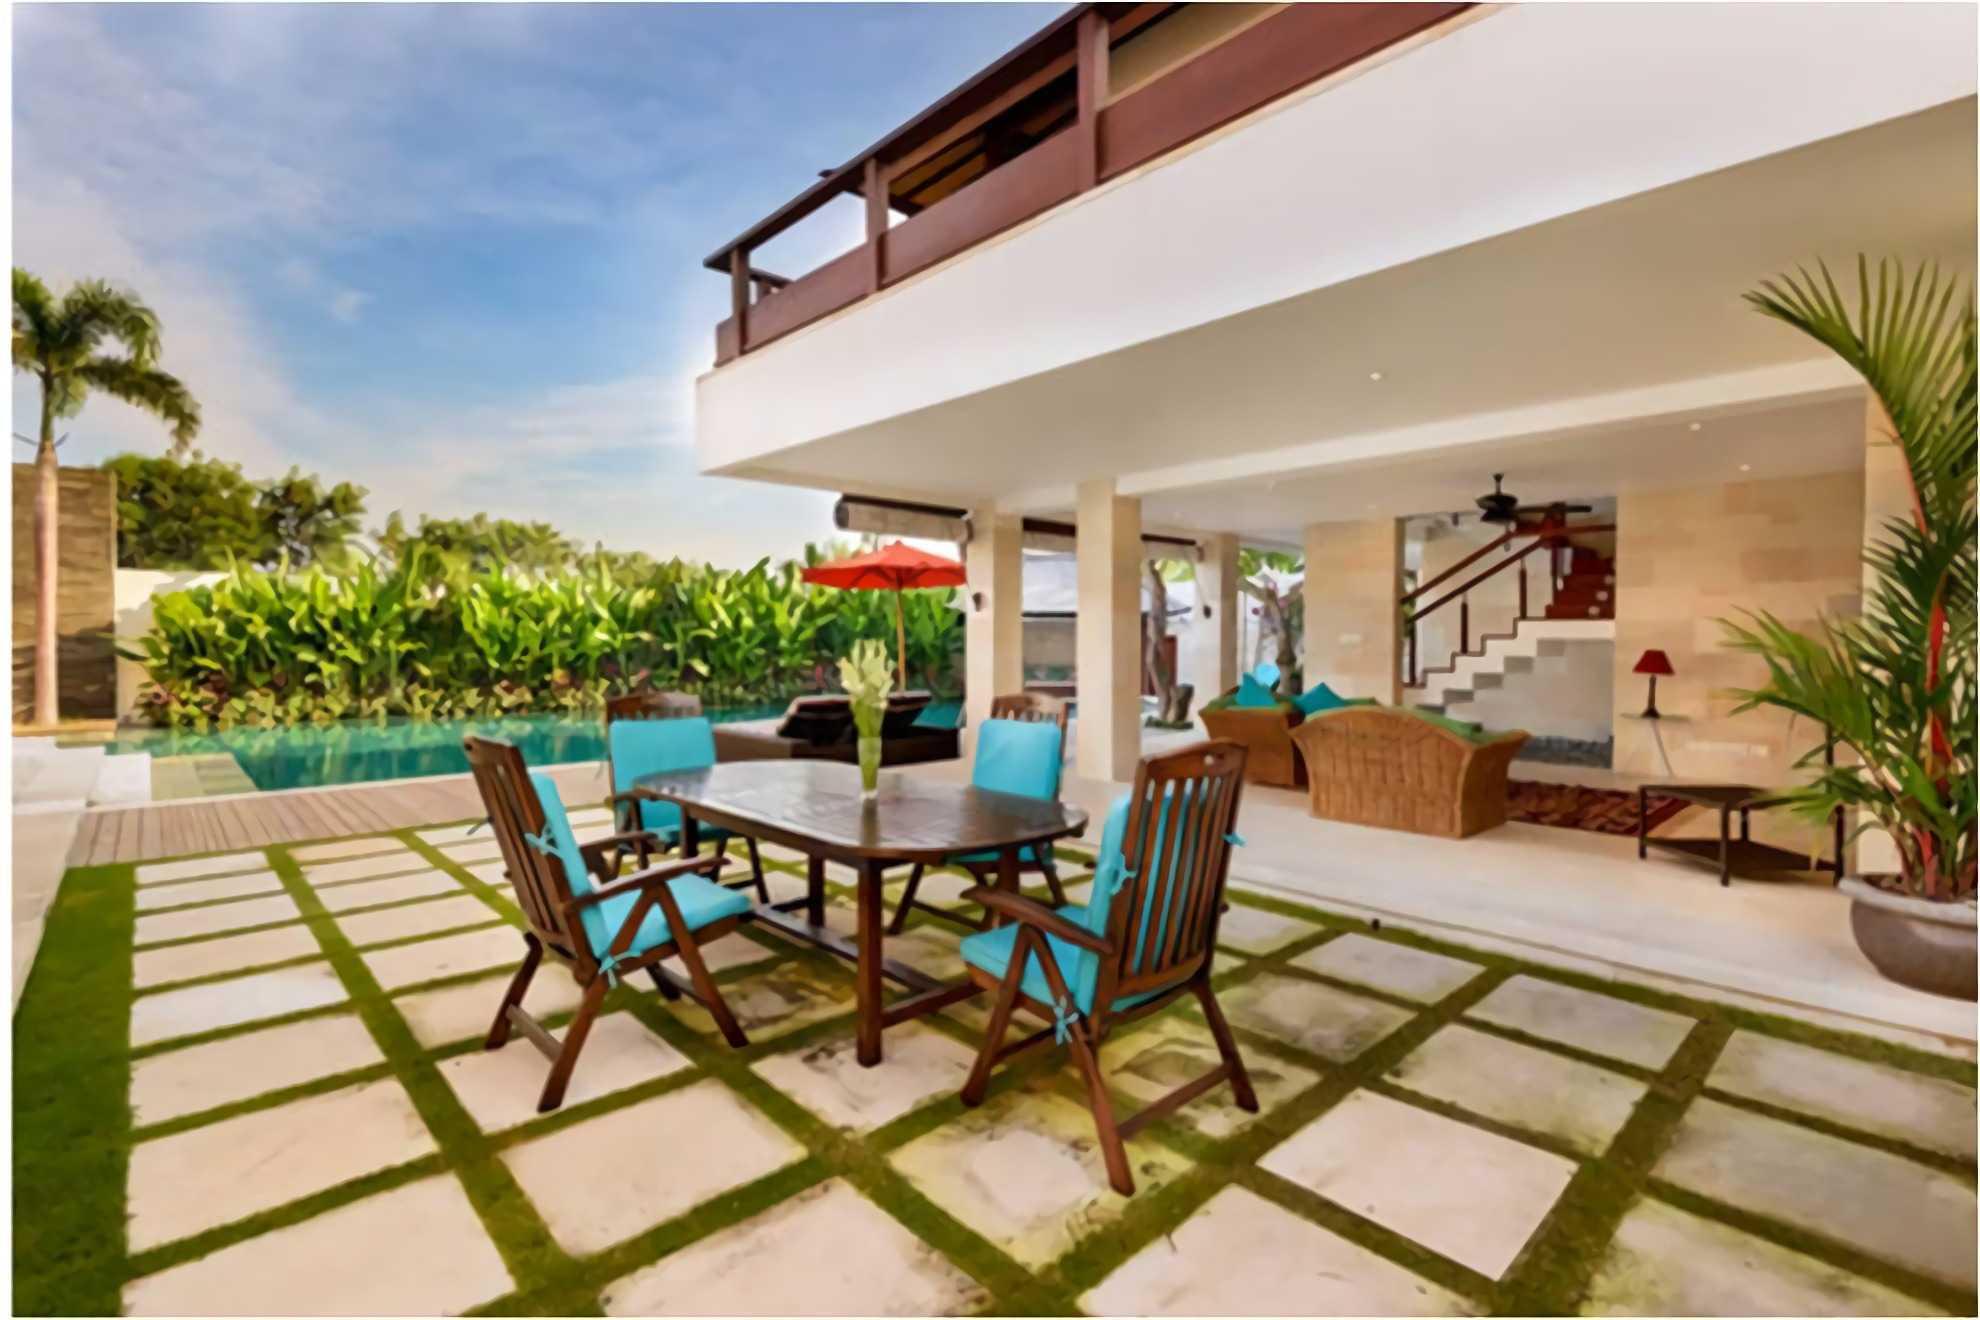 Hg Architects & Designers Associates Villa Saya Canggu, Bali Canggu, Bali Seating Area   24258